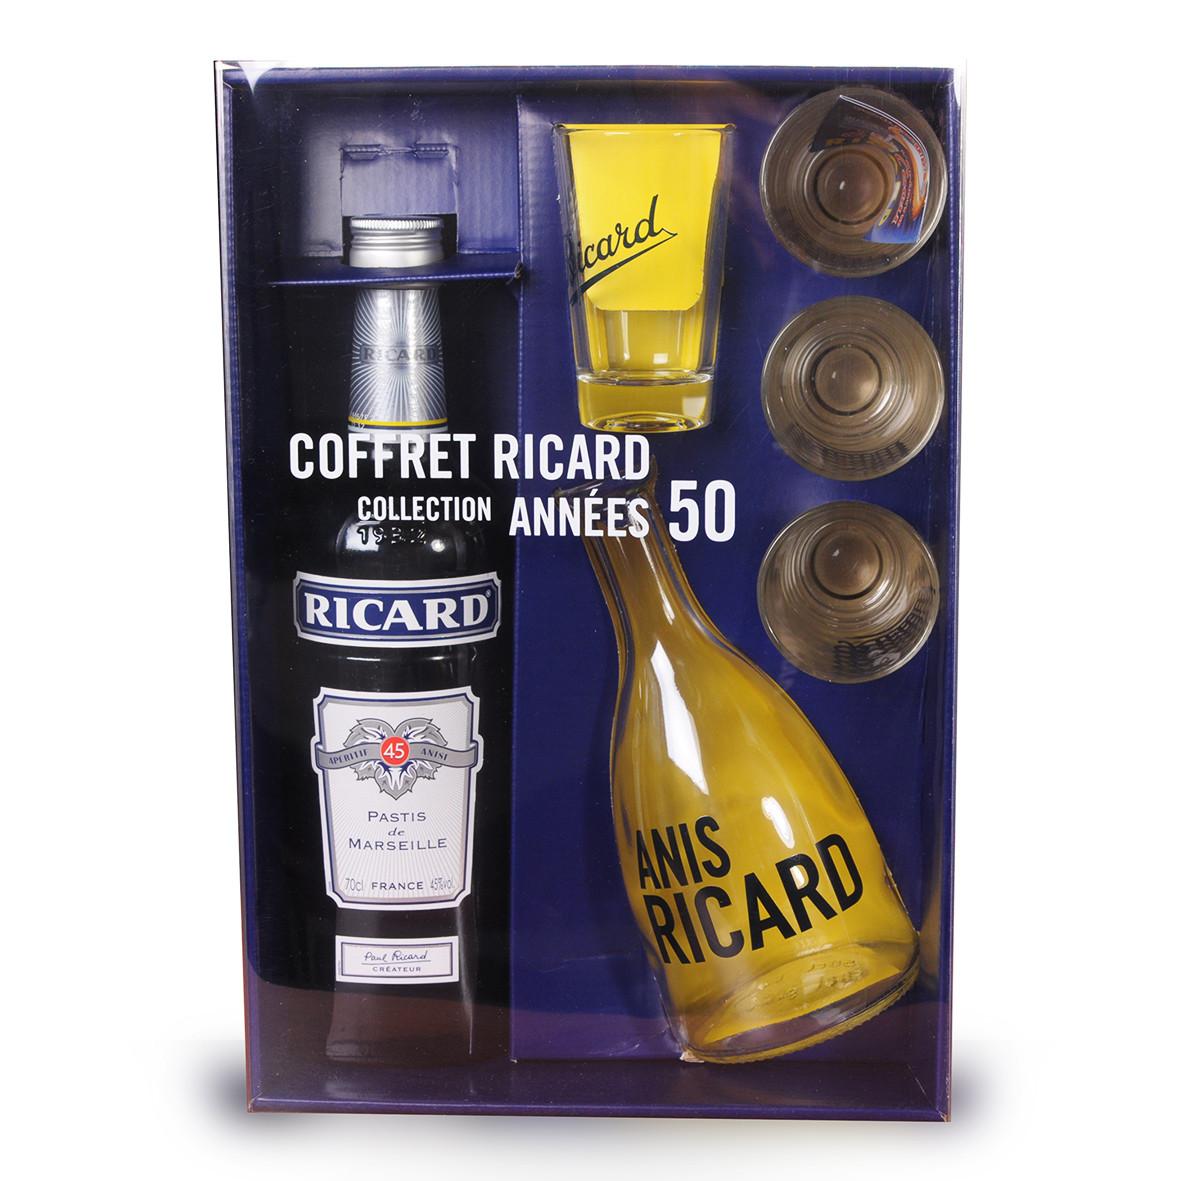 Coffret Ricard 70cl Collection Années 50 www.odyssee-vins.com